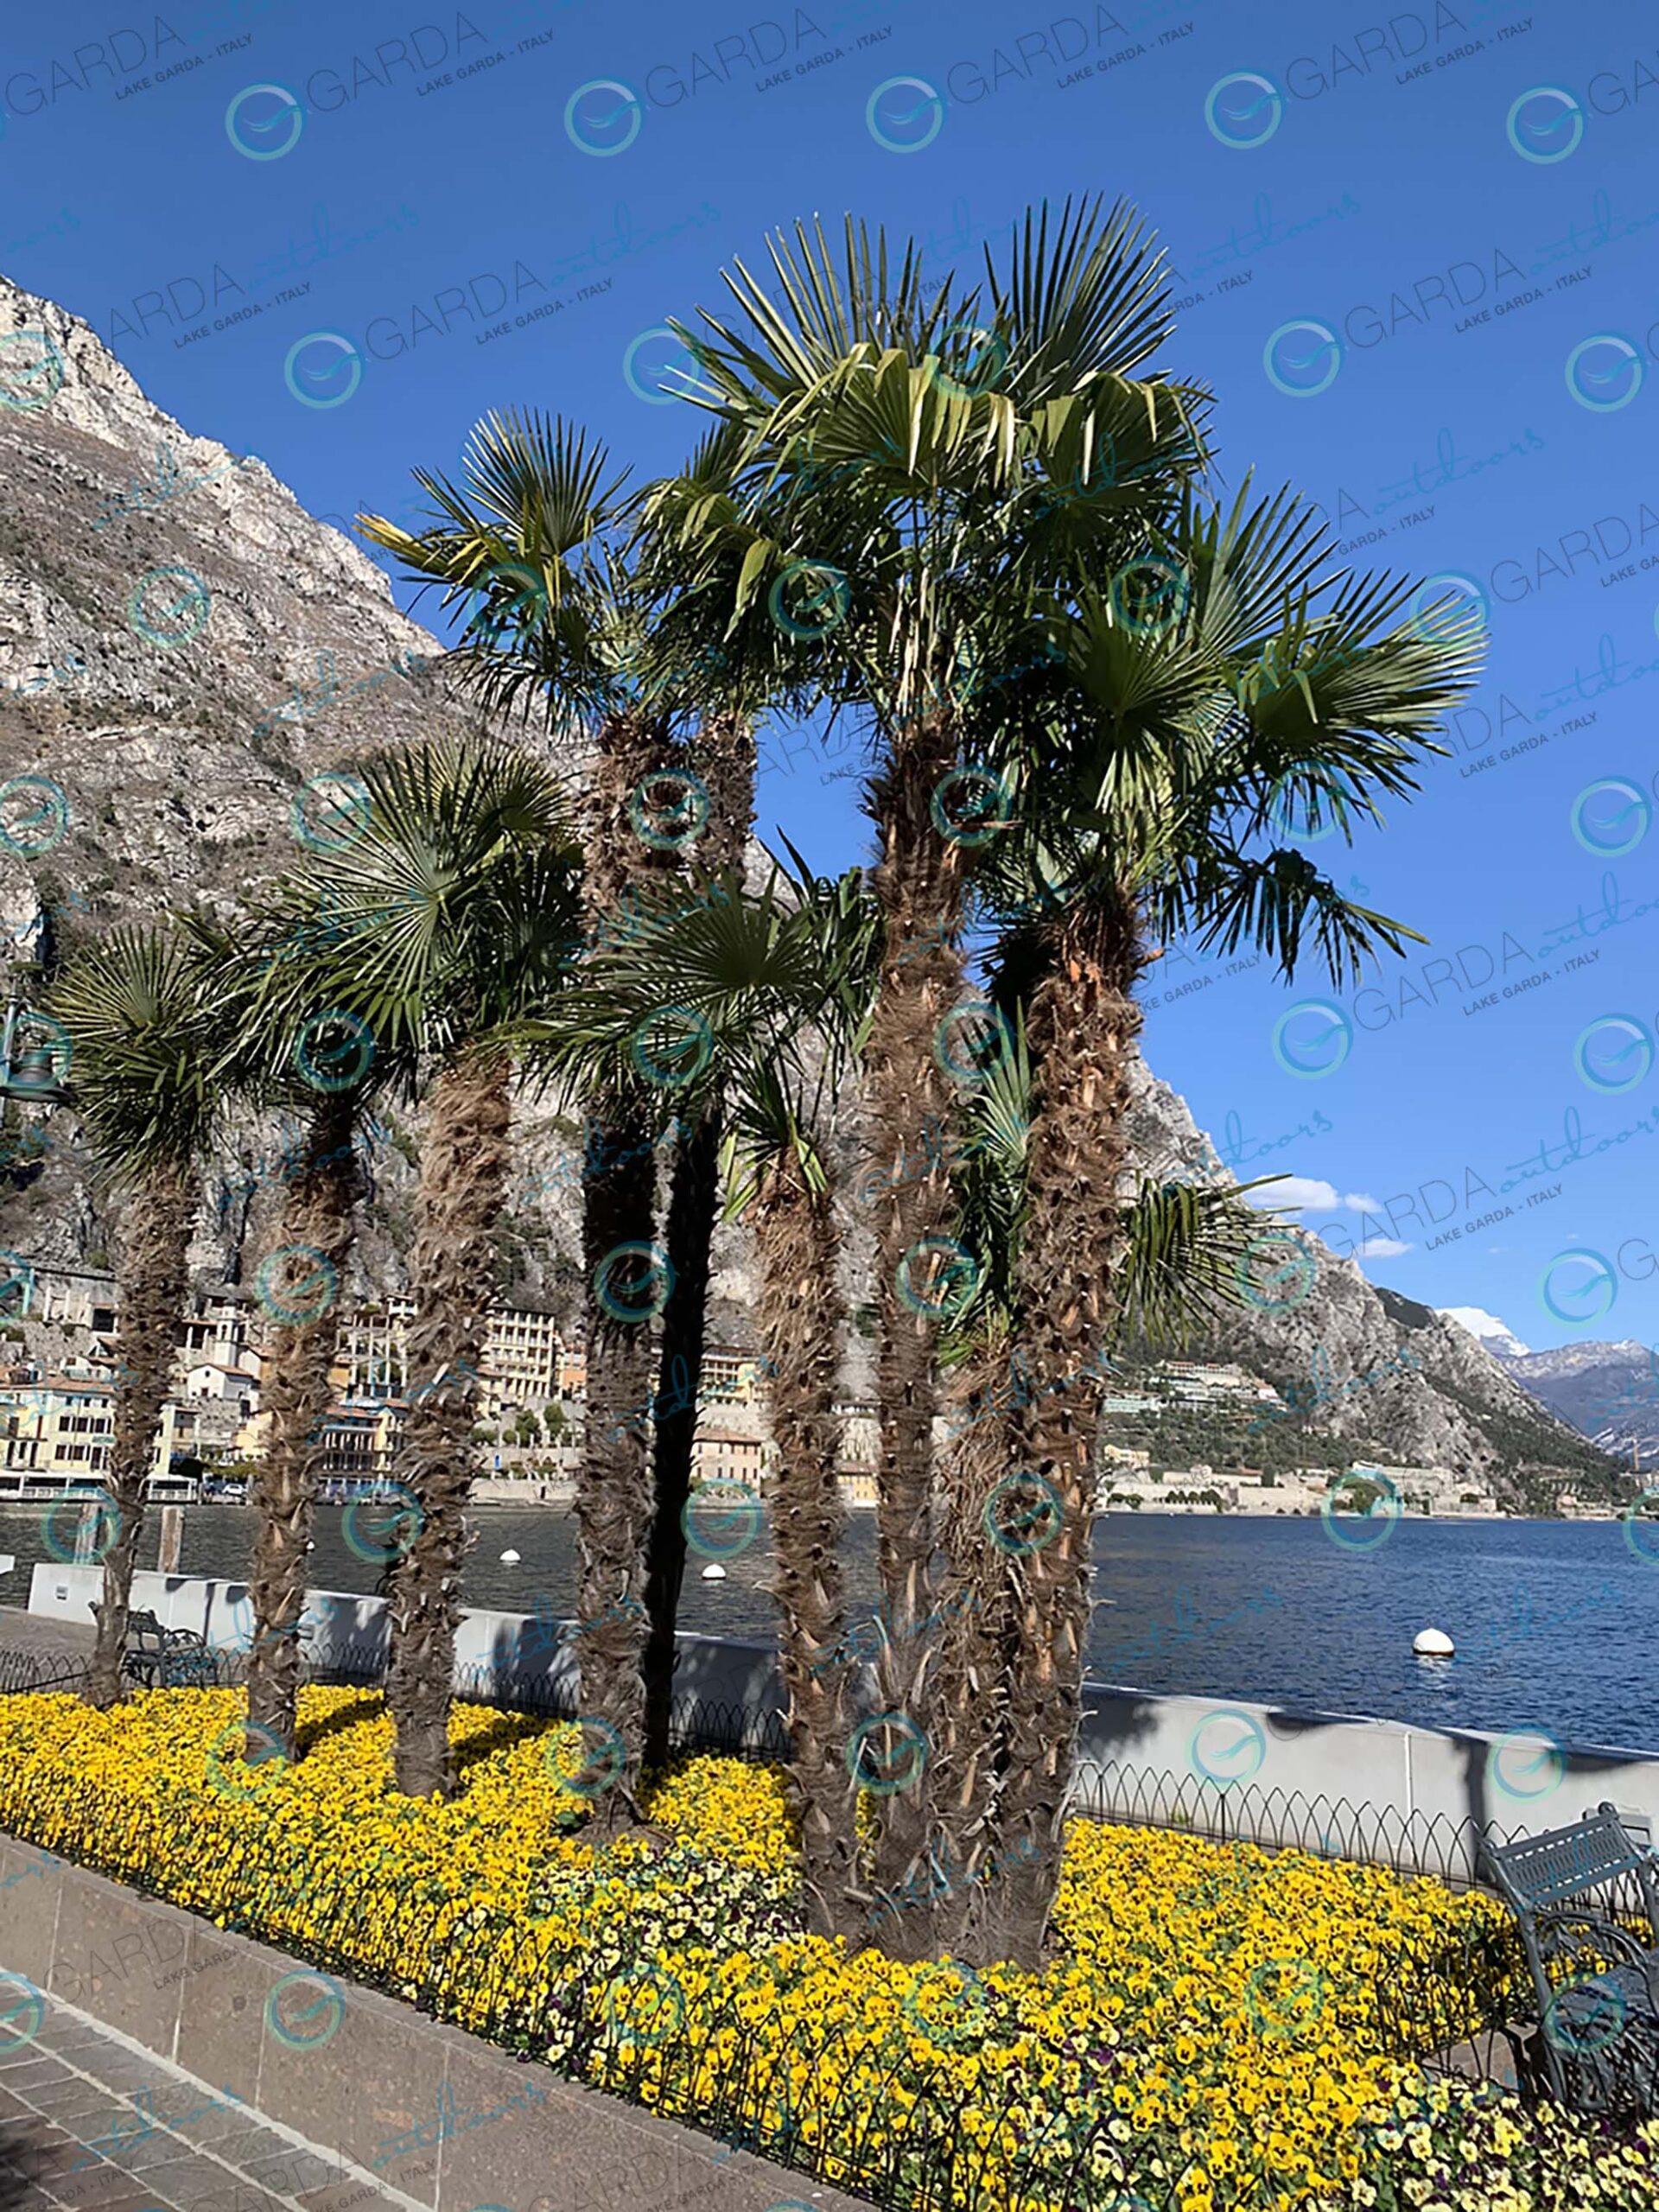 Limone sul Garda - palms and flowers